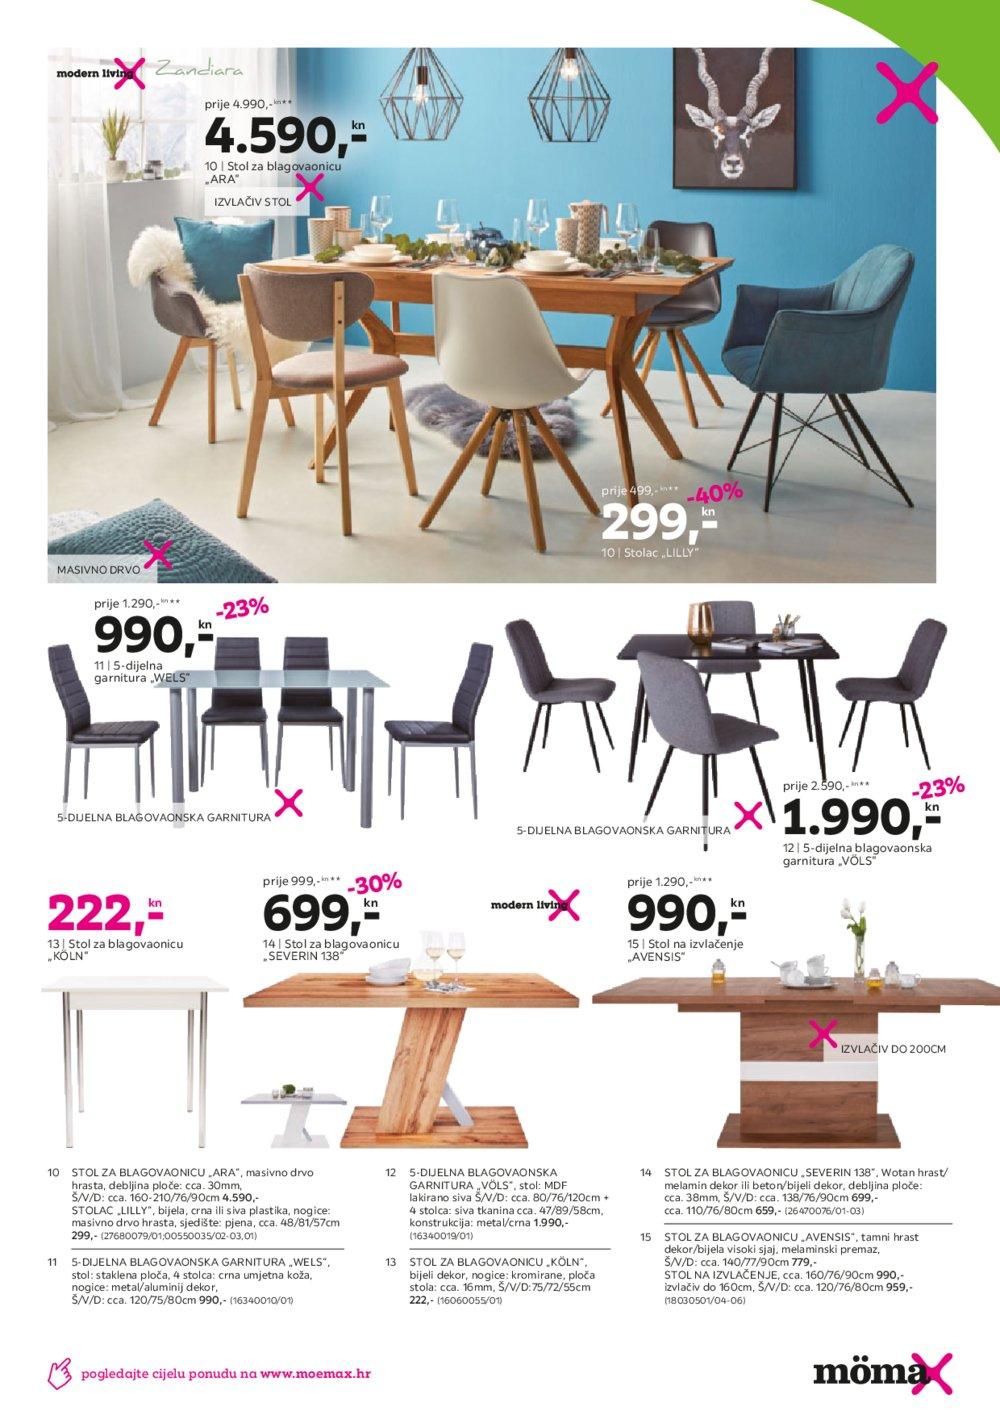 Momax katalog Kuhinje po mjeri 14.07.-03.08.2020.